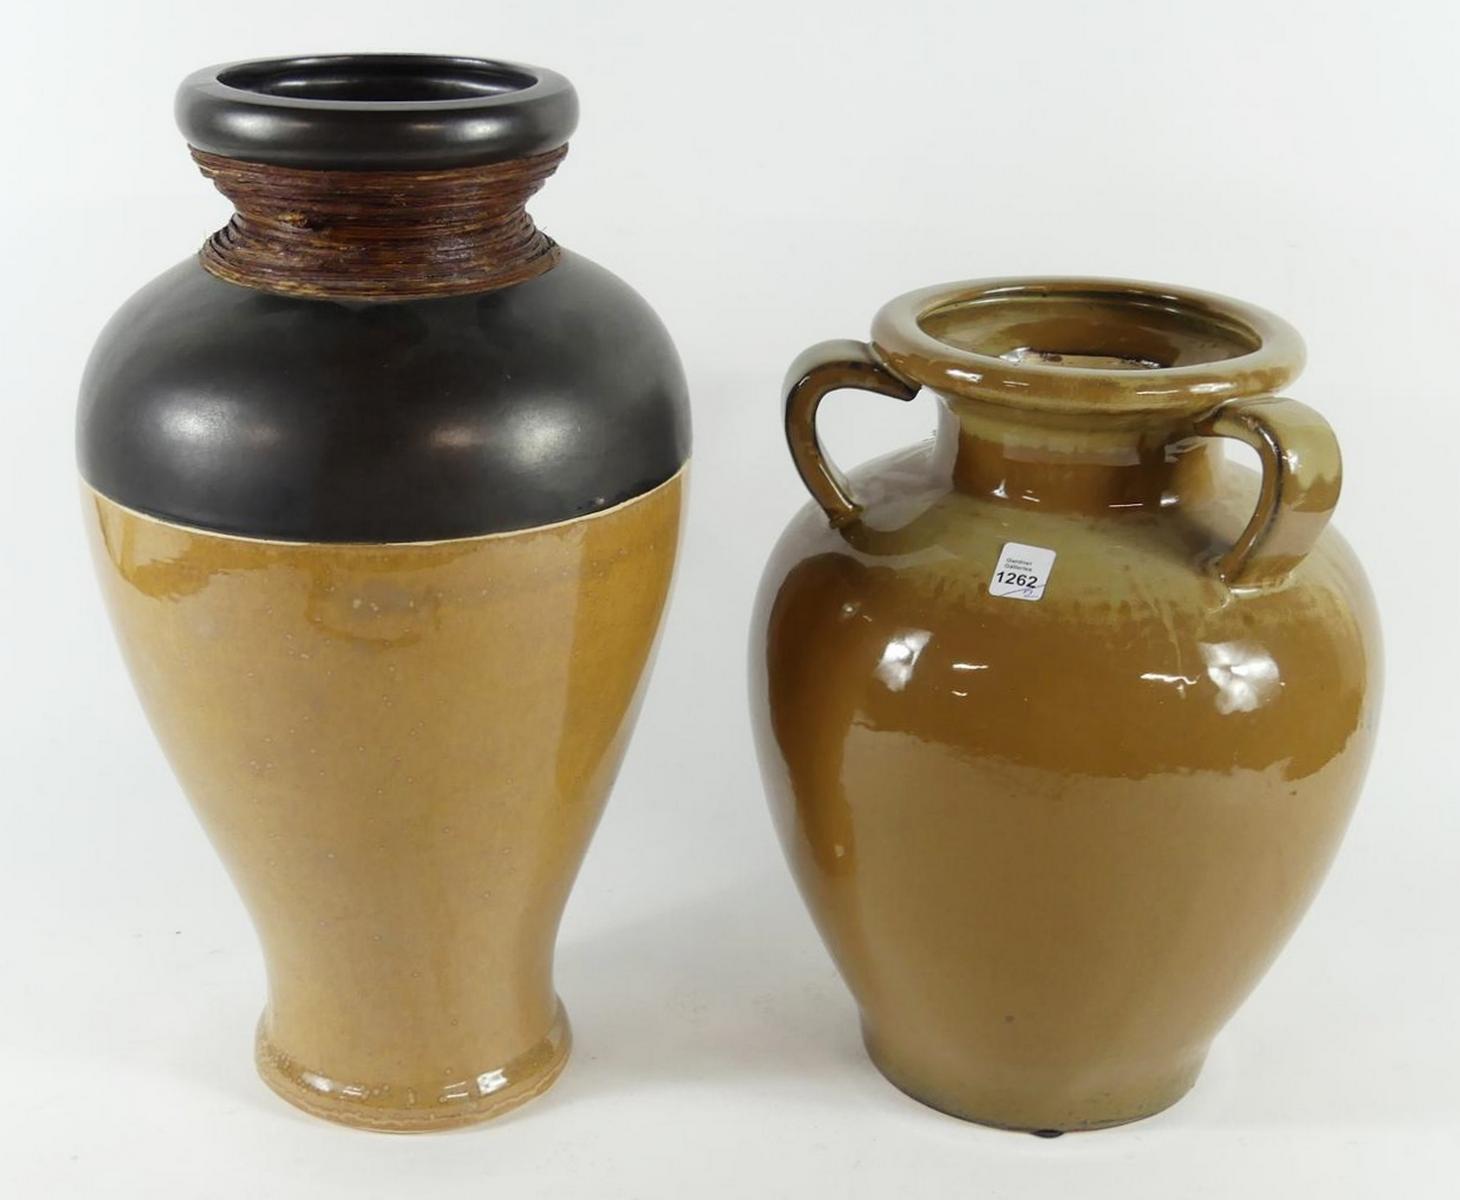 TWO CERAMIC JARS